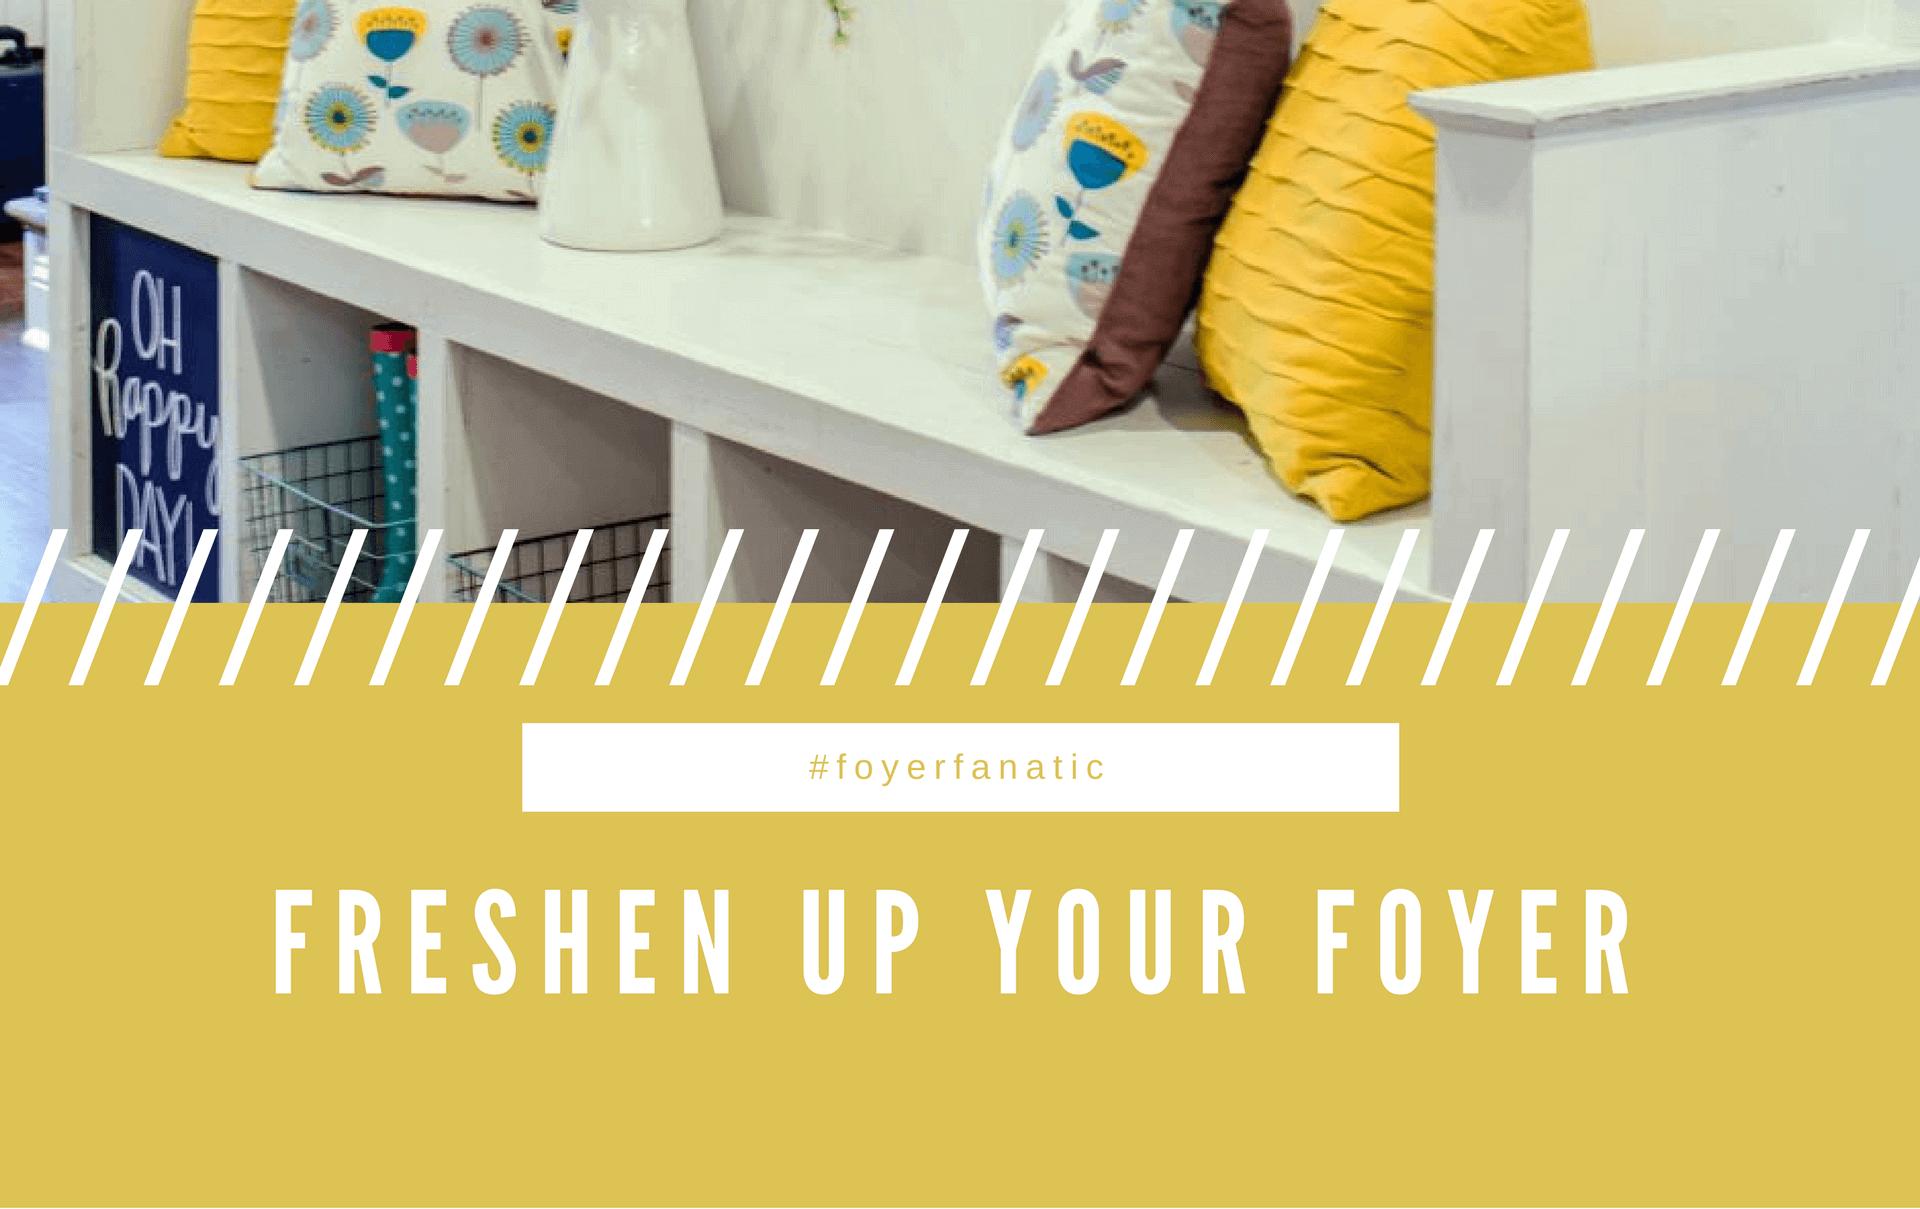 Freshen Up Your Foyer